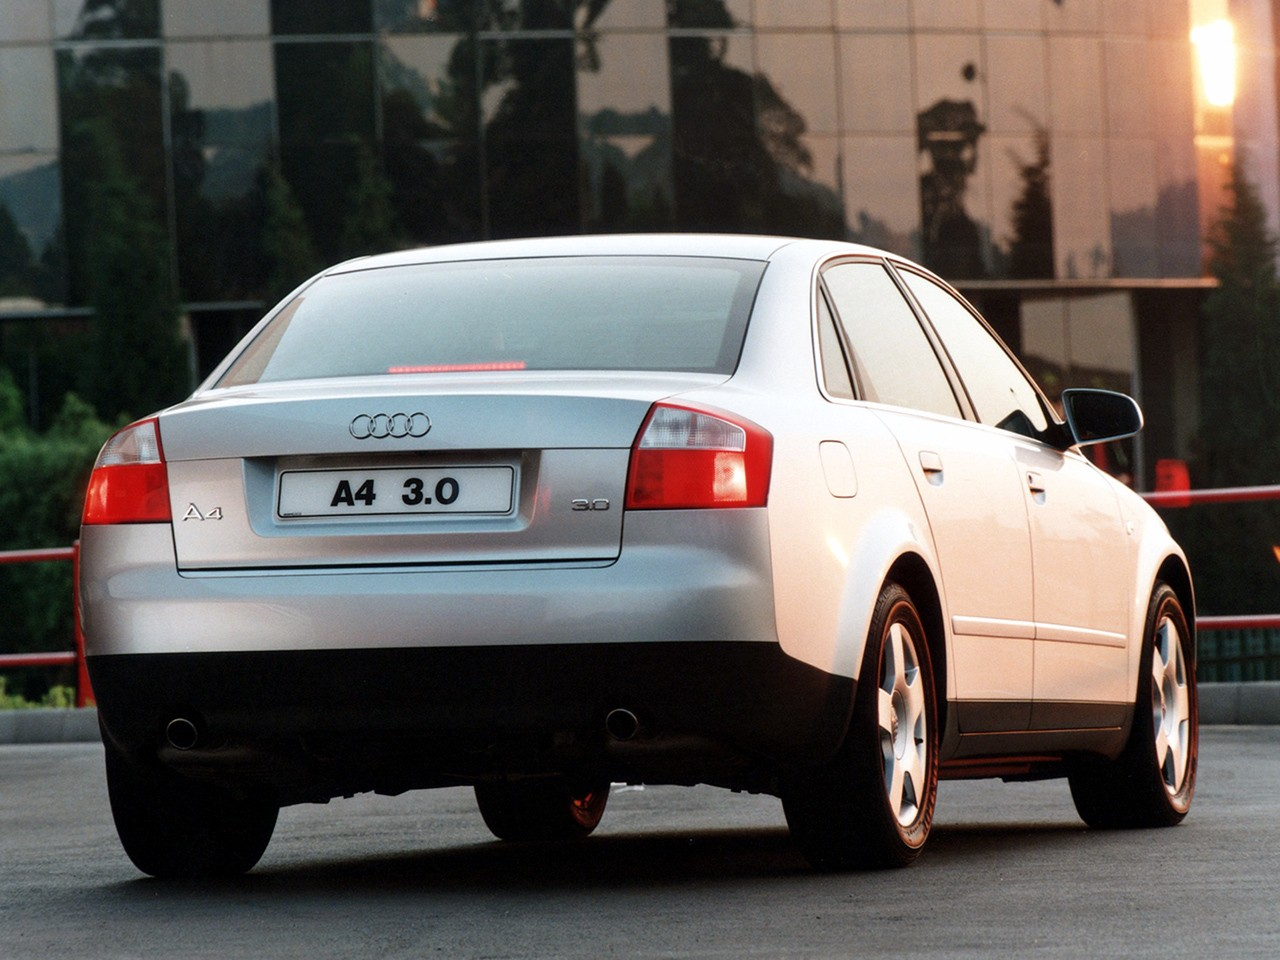 Audi A Avant together with Vssge Ayj Kyu Yvg Img in addition Audi A Avant in addition Audi A moreover Audia. on 2003 audi a4 cvt transmission